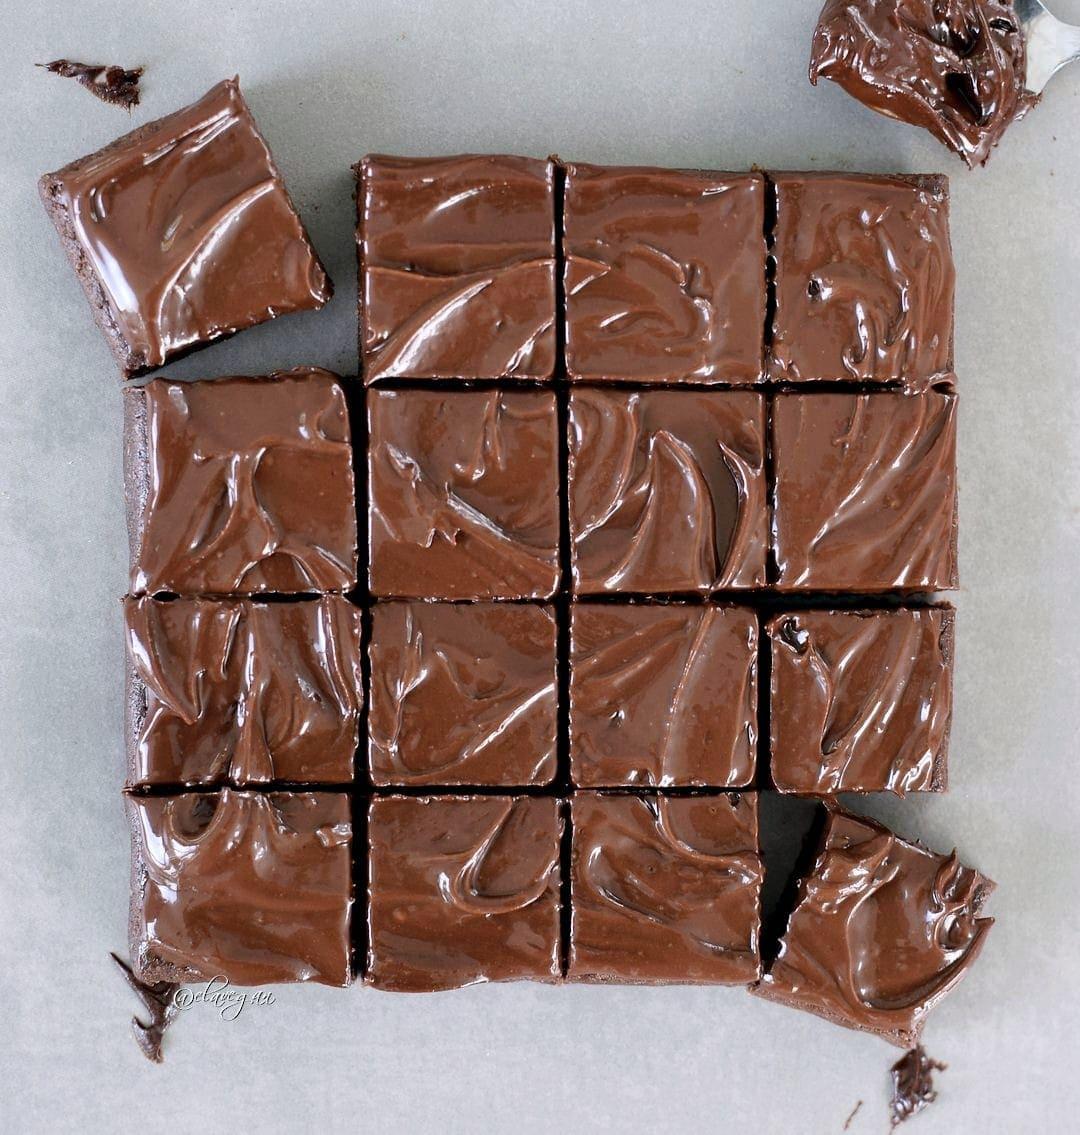 16 Brownie-Stücke mit gesunder Schokoladenglasur